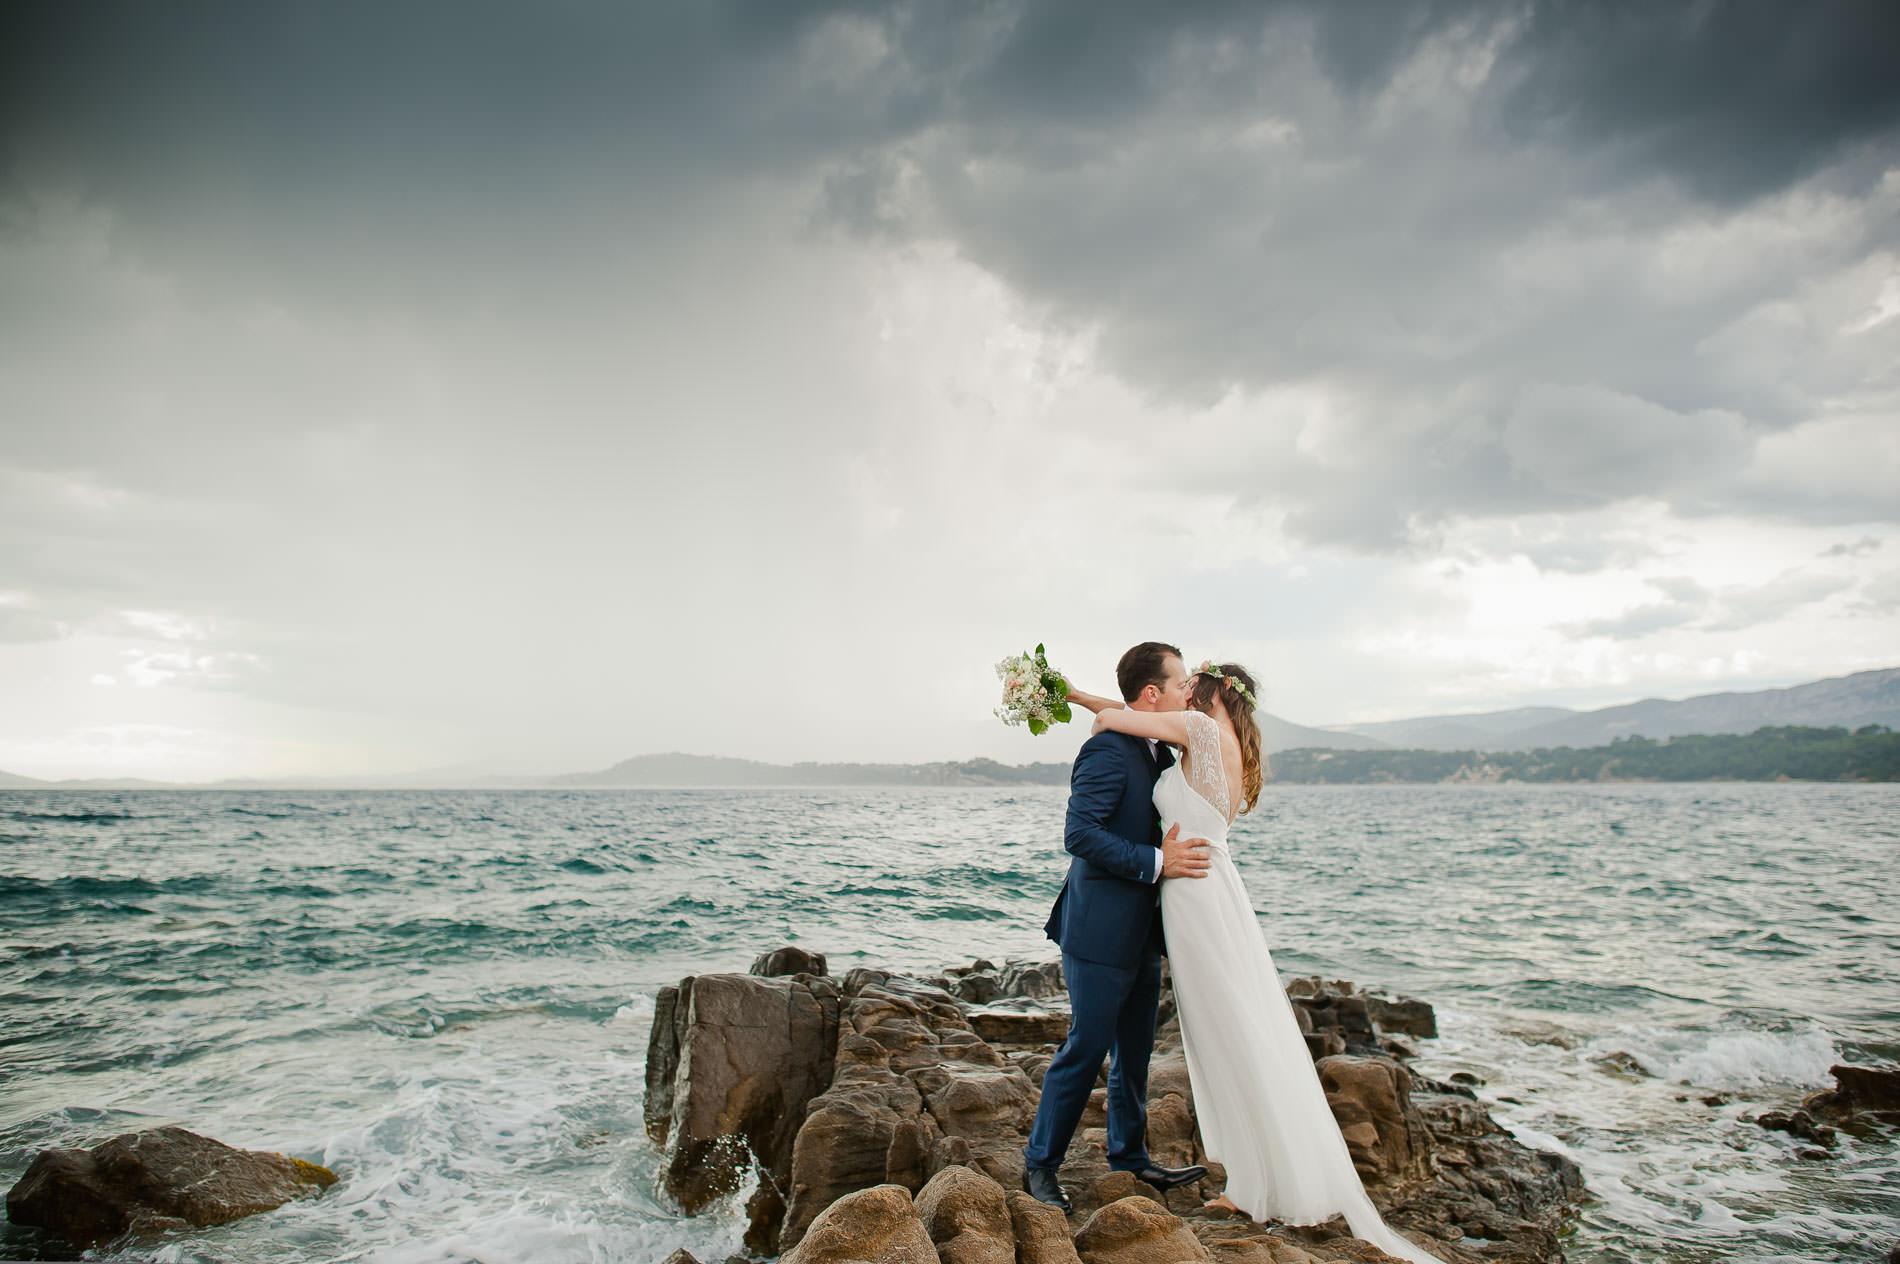 photographe-de-mariage-lyon-provence-44